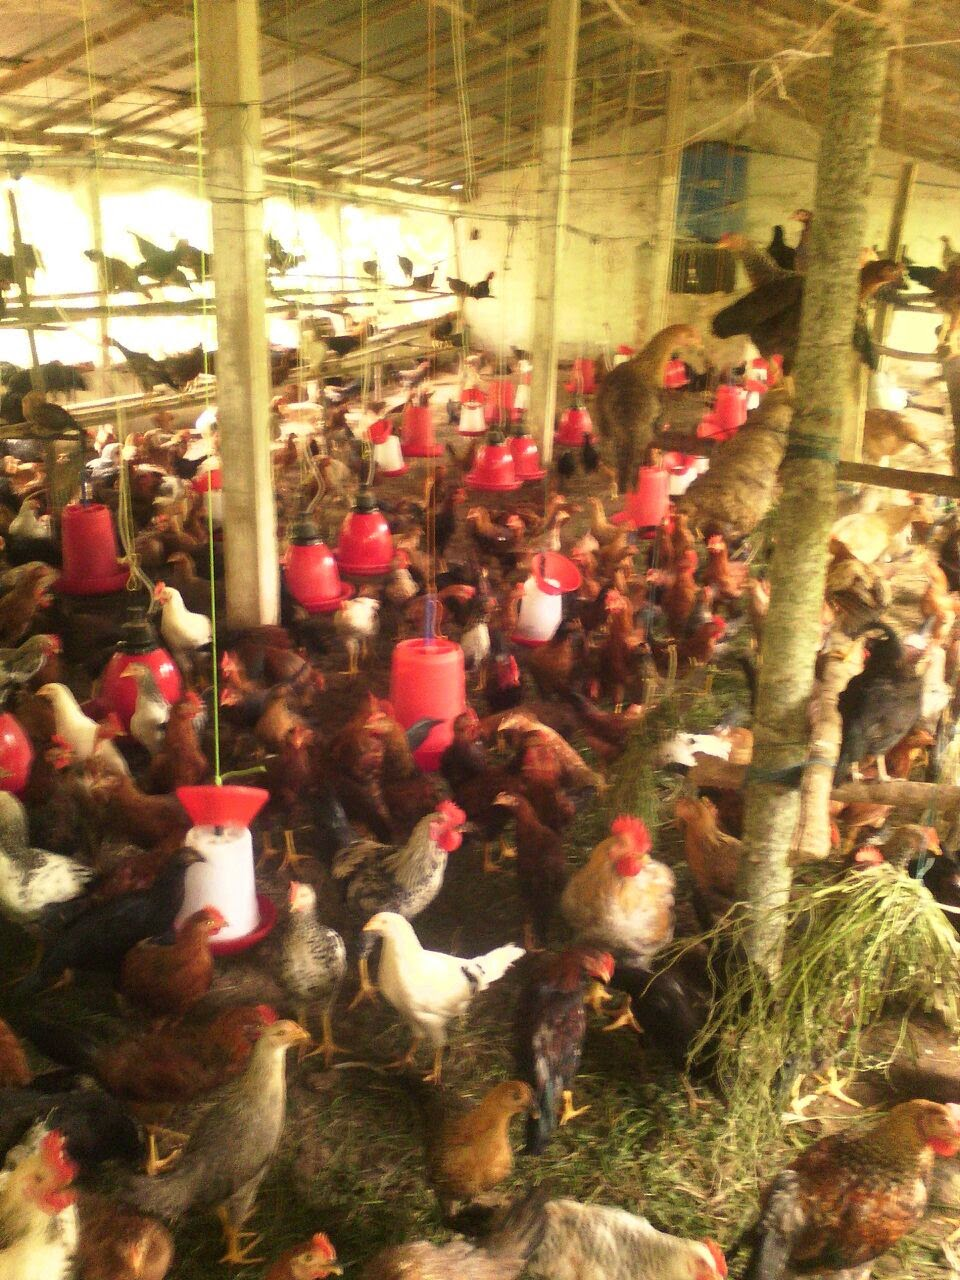 mysuru naati kkoli backyard poultry farming country chicken